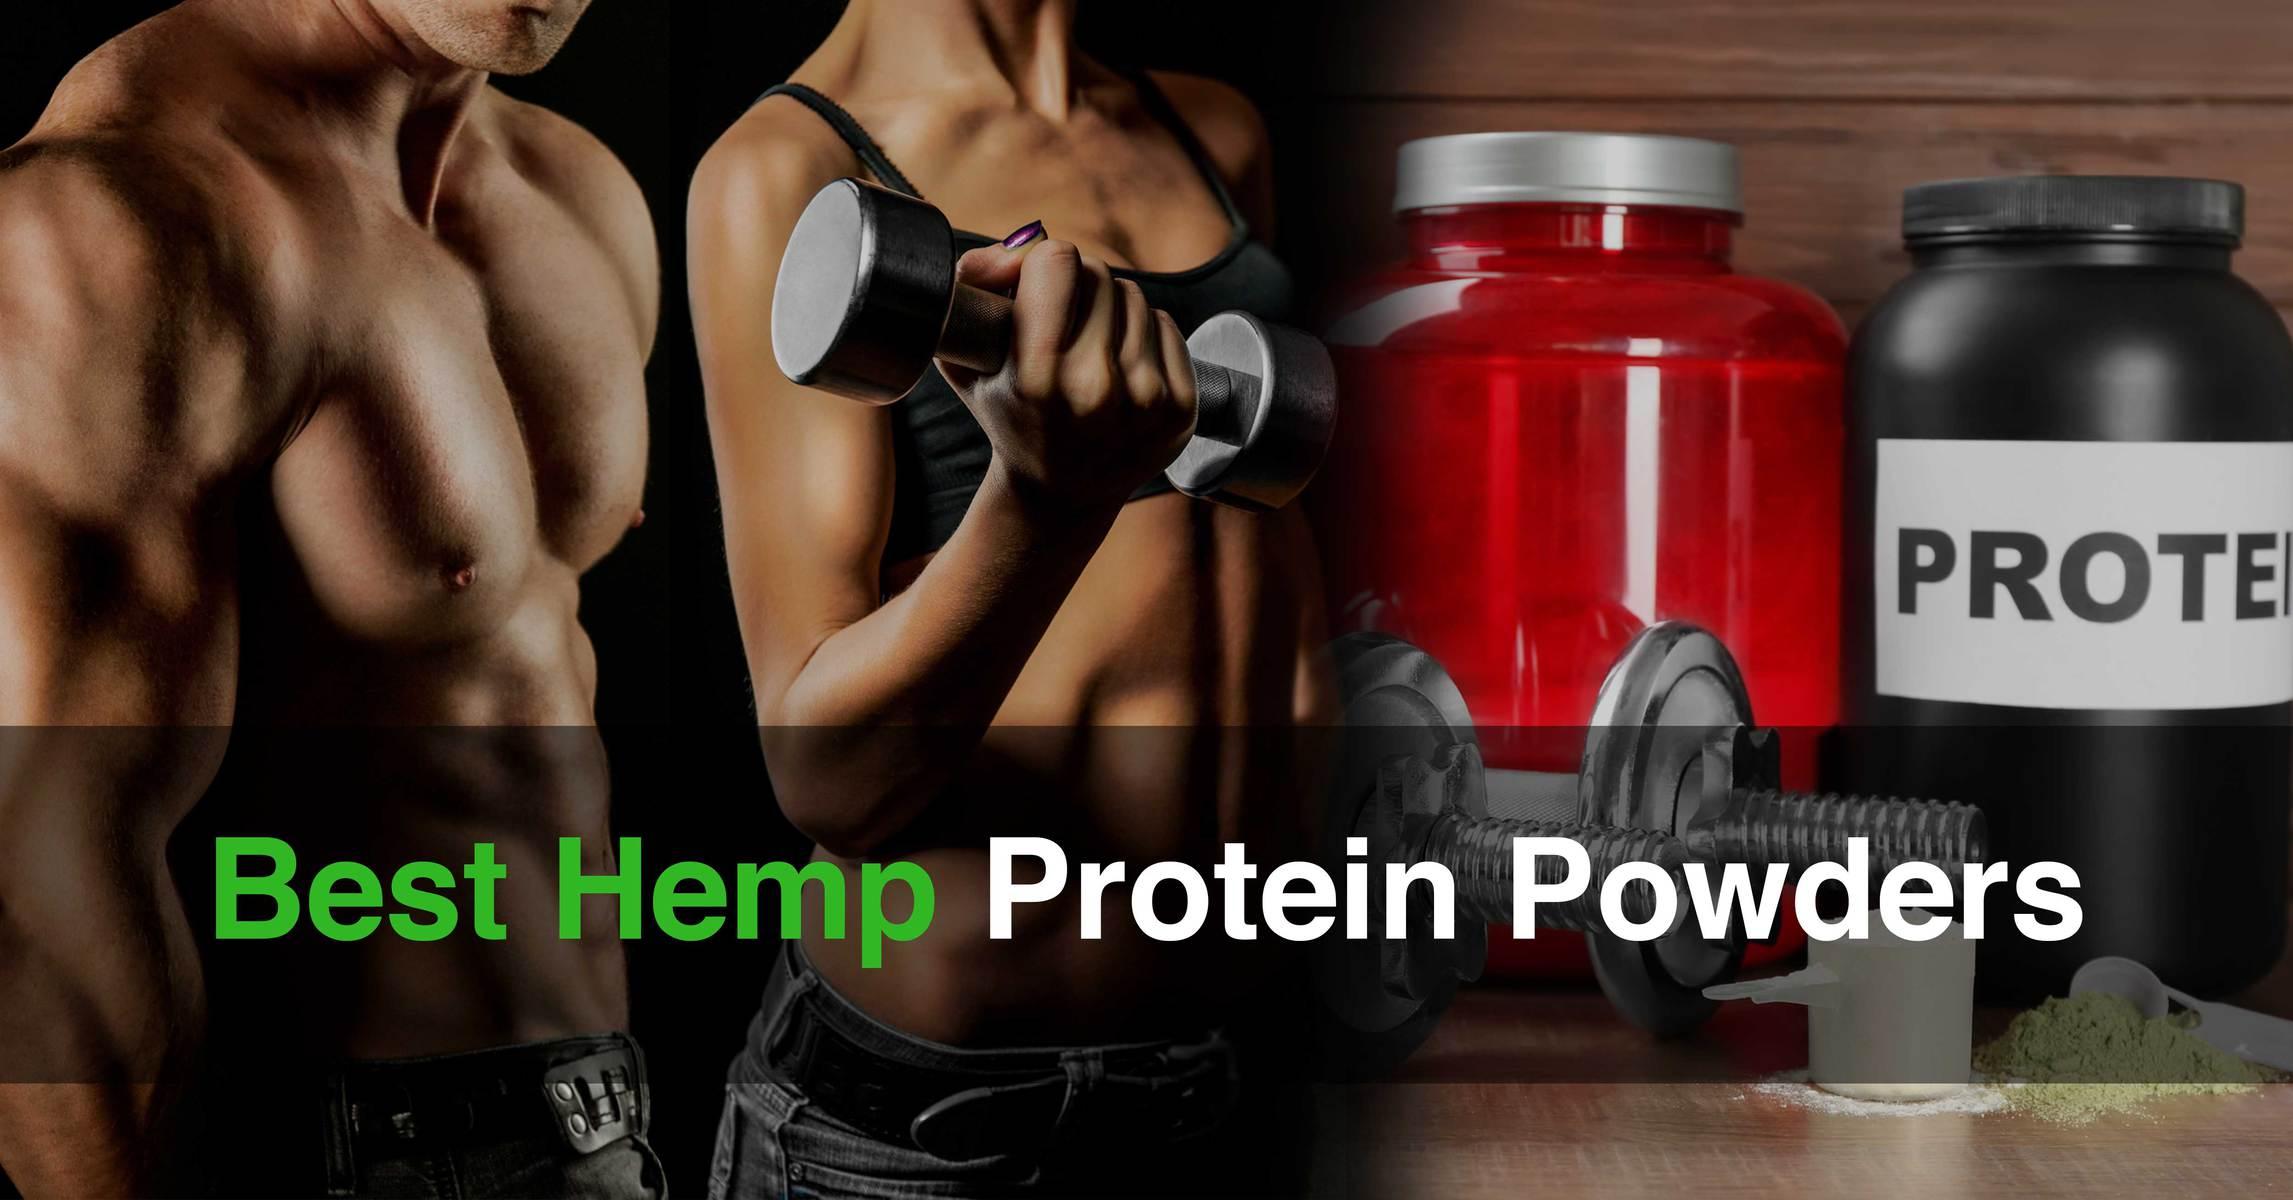 Best Hemp Protein Powders Cover Image